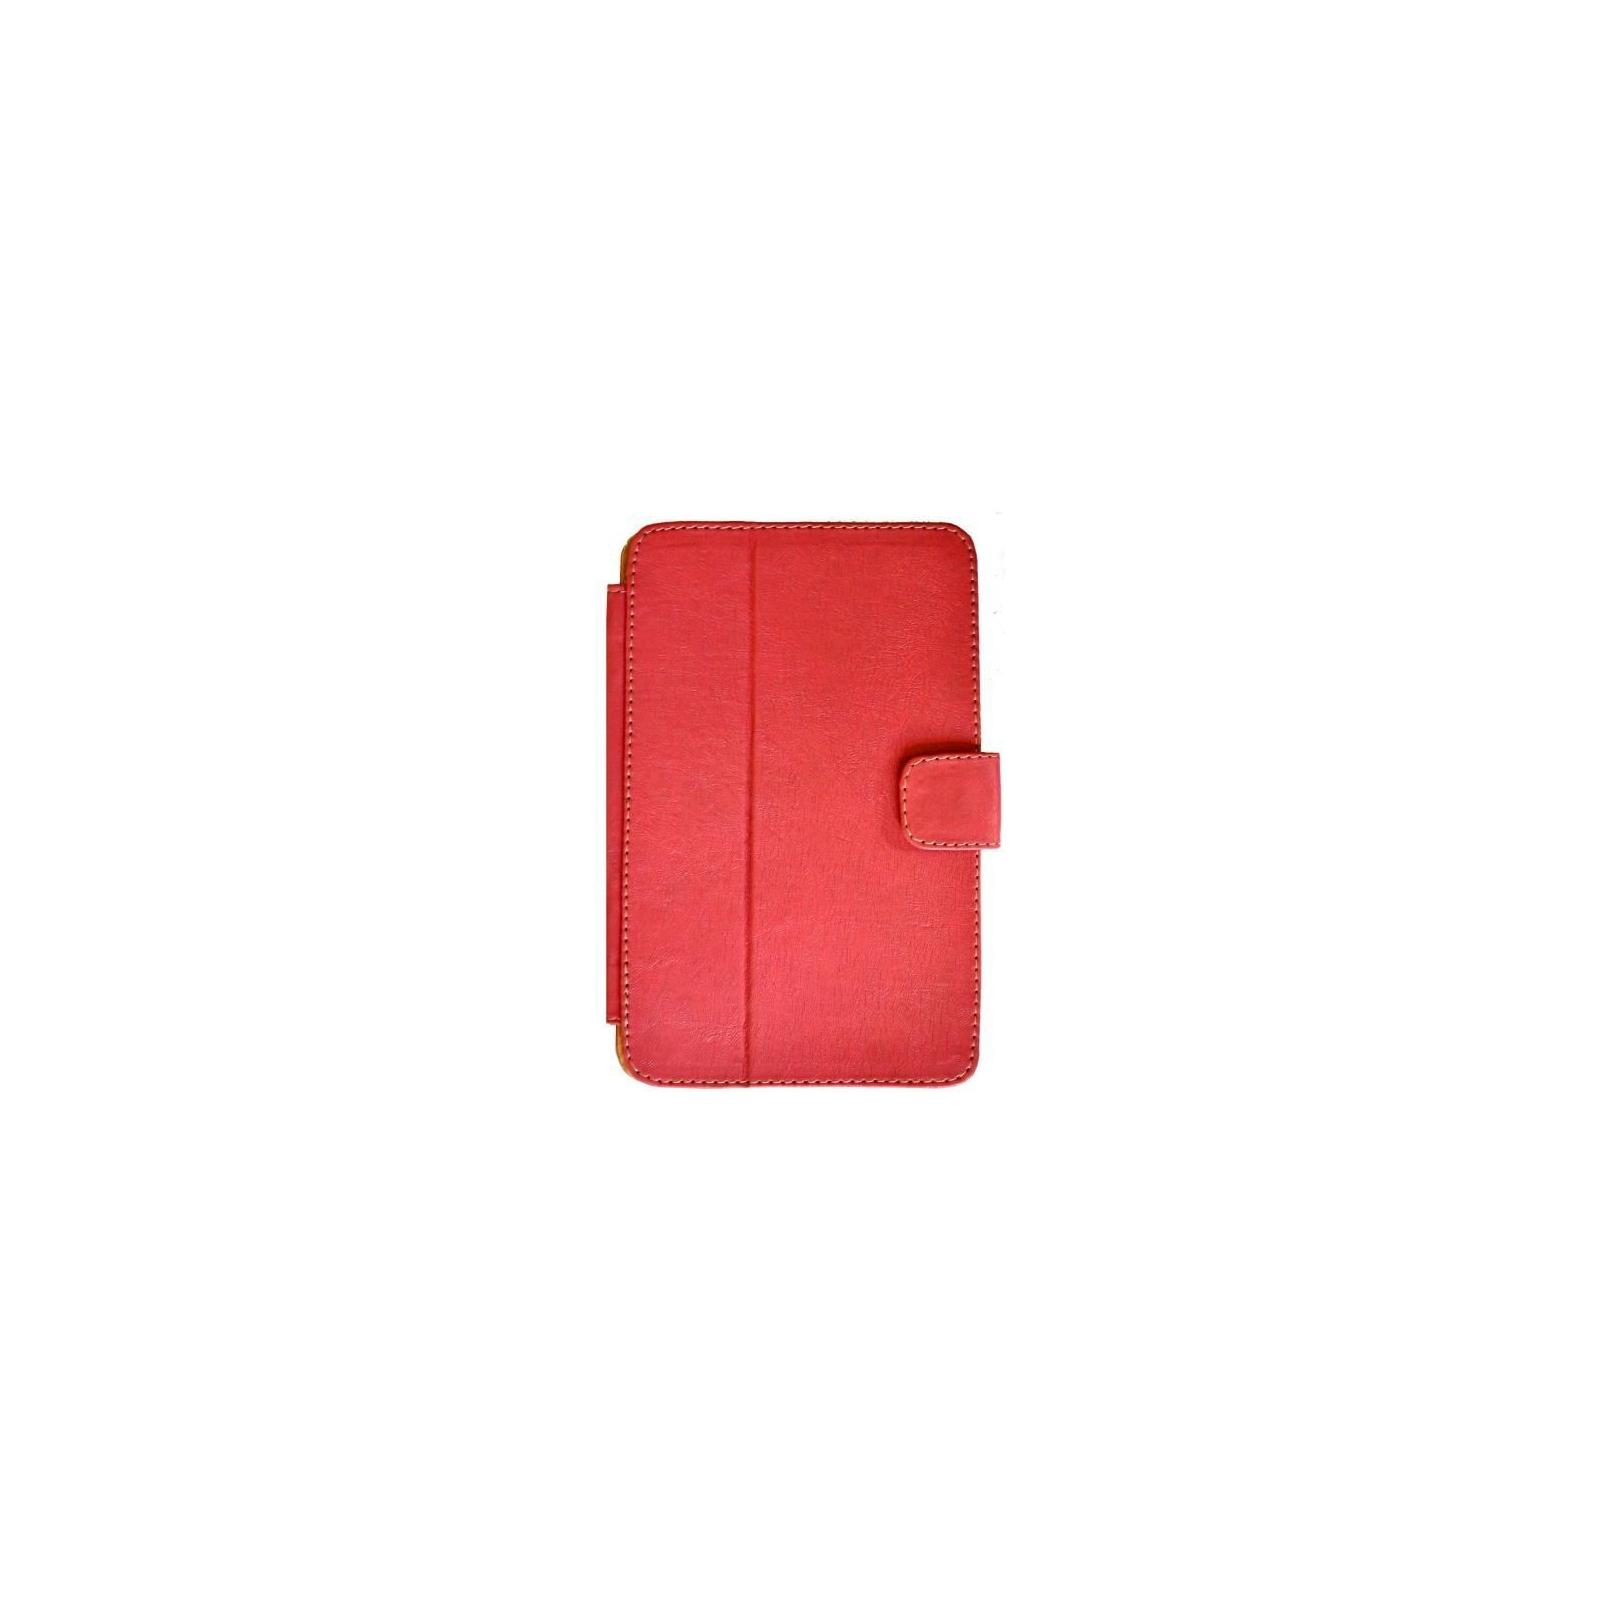 Чехол для планшета Vento 9 COOL - red